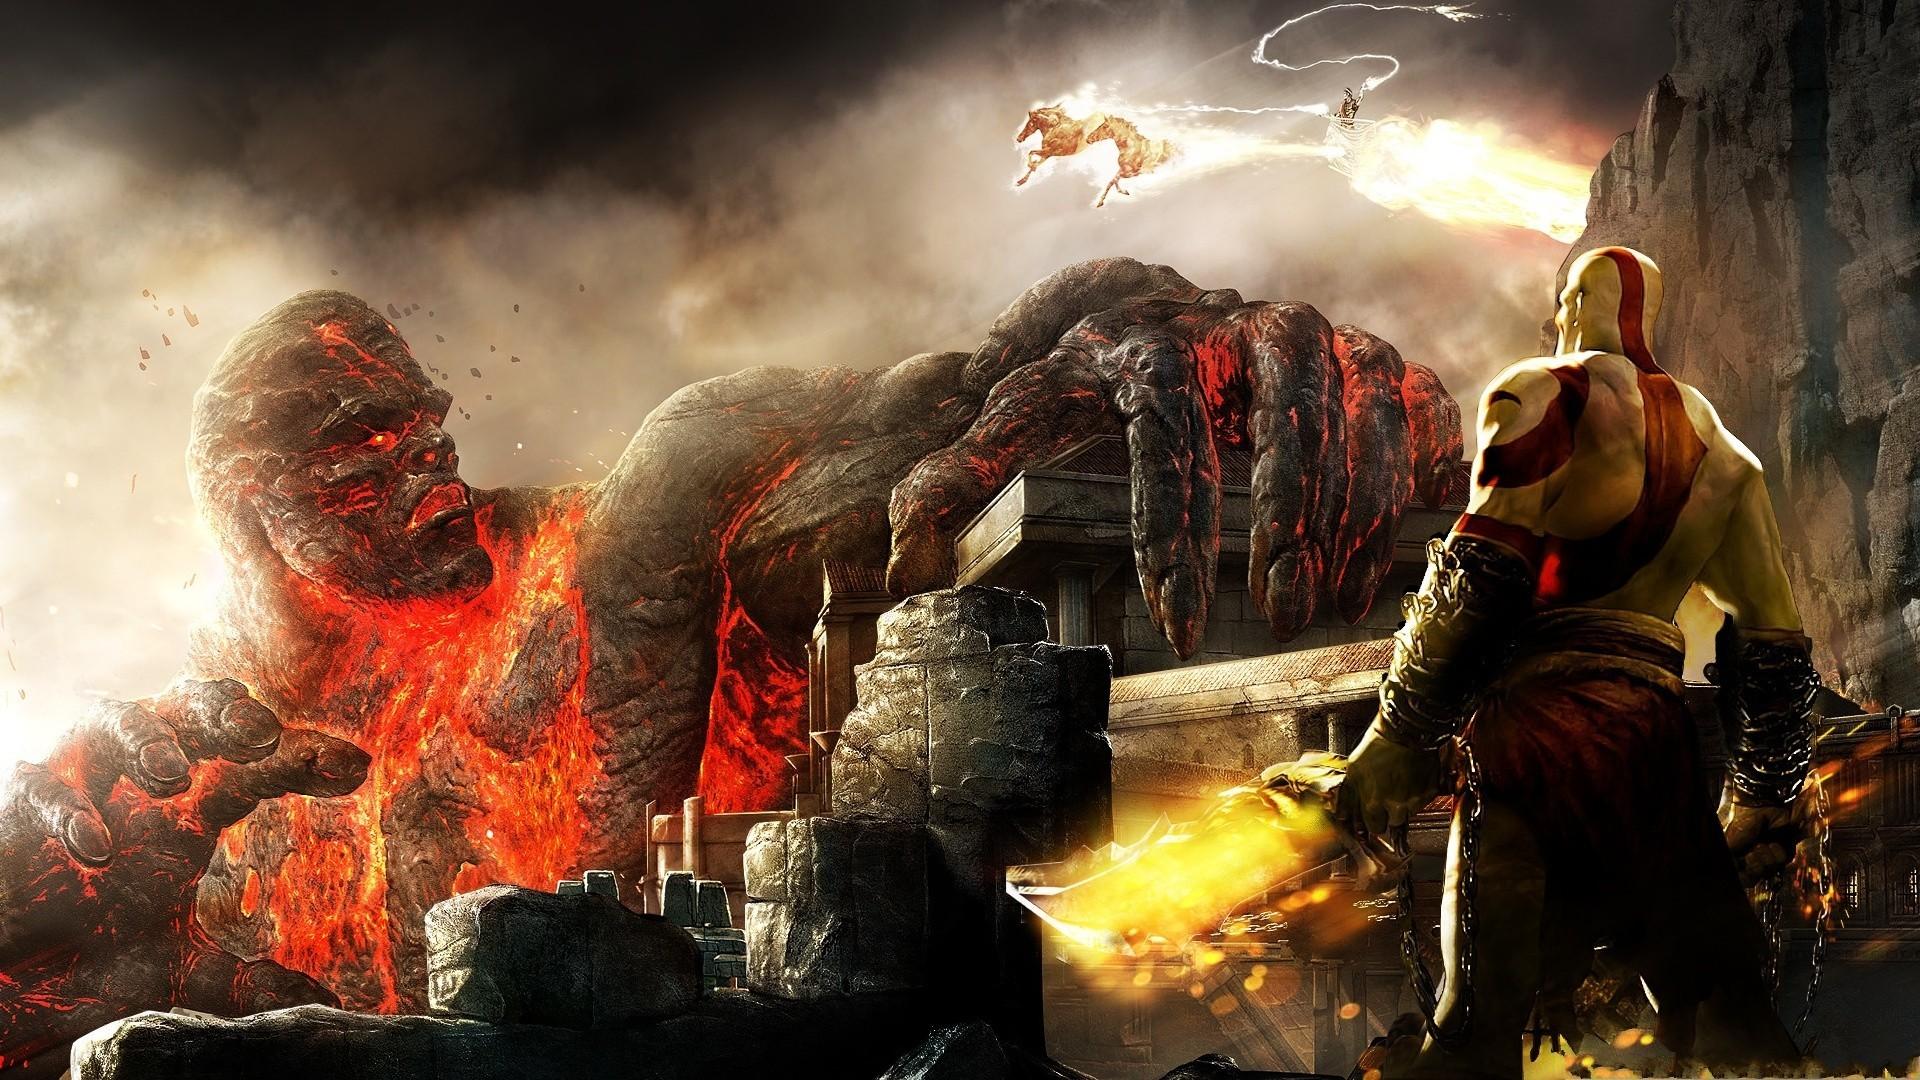 54 God Of War HD Wallpapers | Backgrounds – Wallpaper Abyss | Epic Car  Wallpapers | Pinterest | Wallpaper backgrounds, Hd wallpaper and Wallpaper